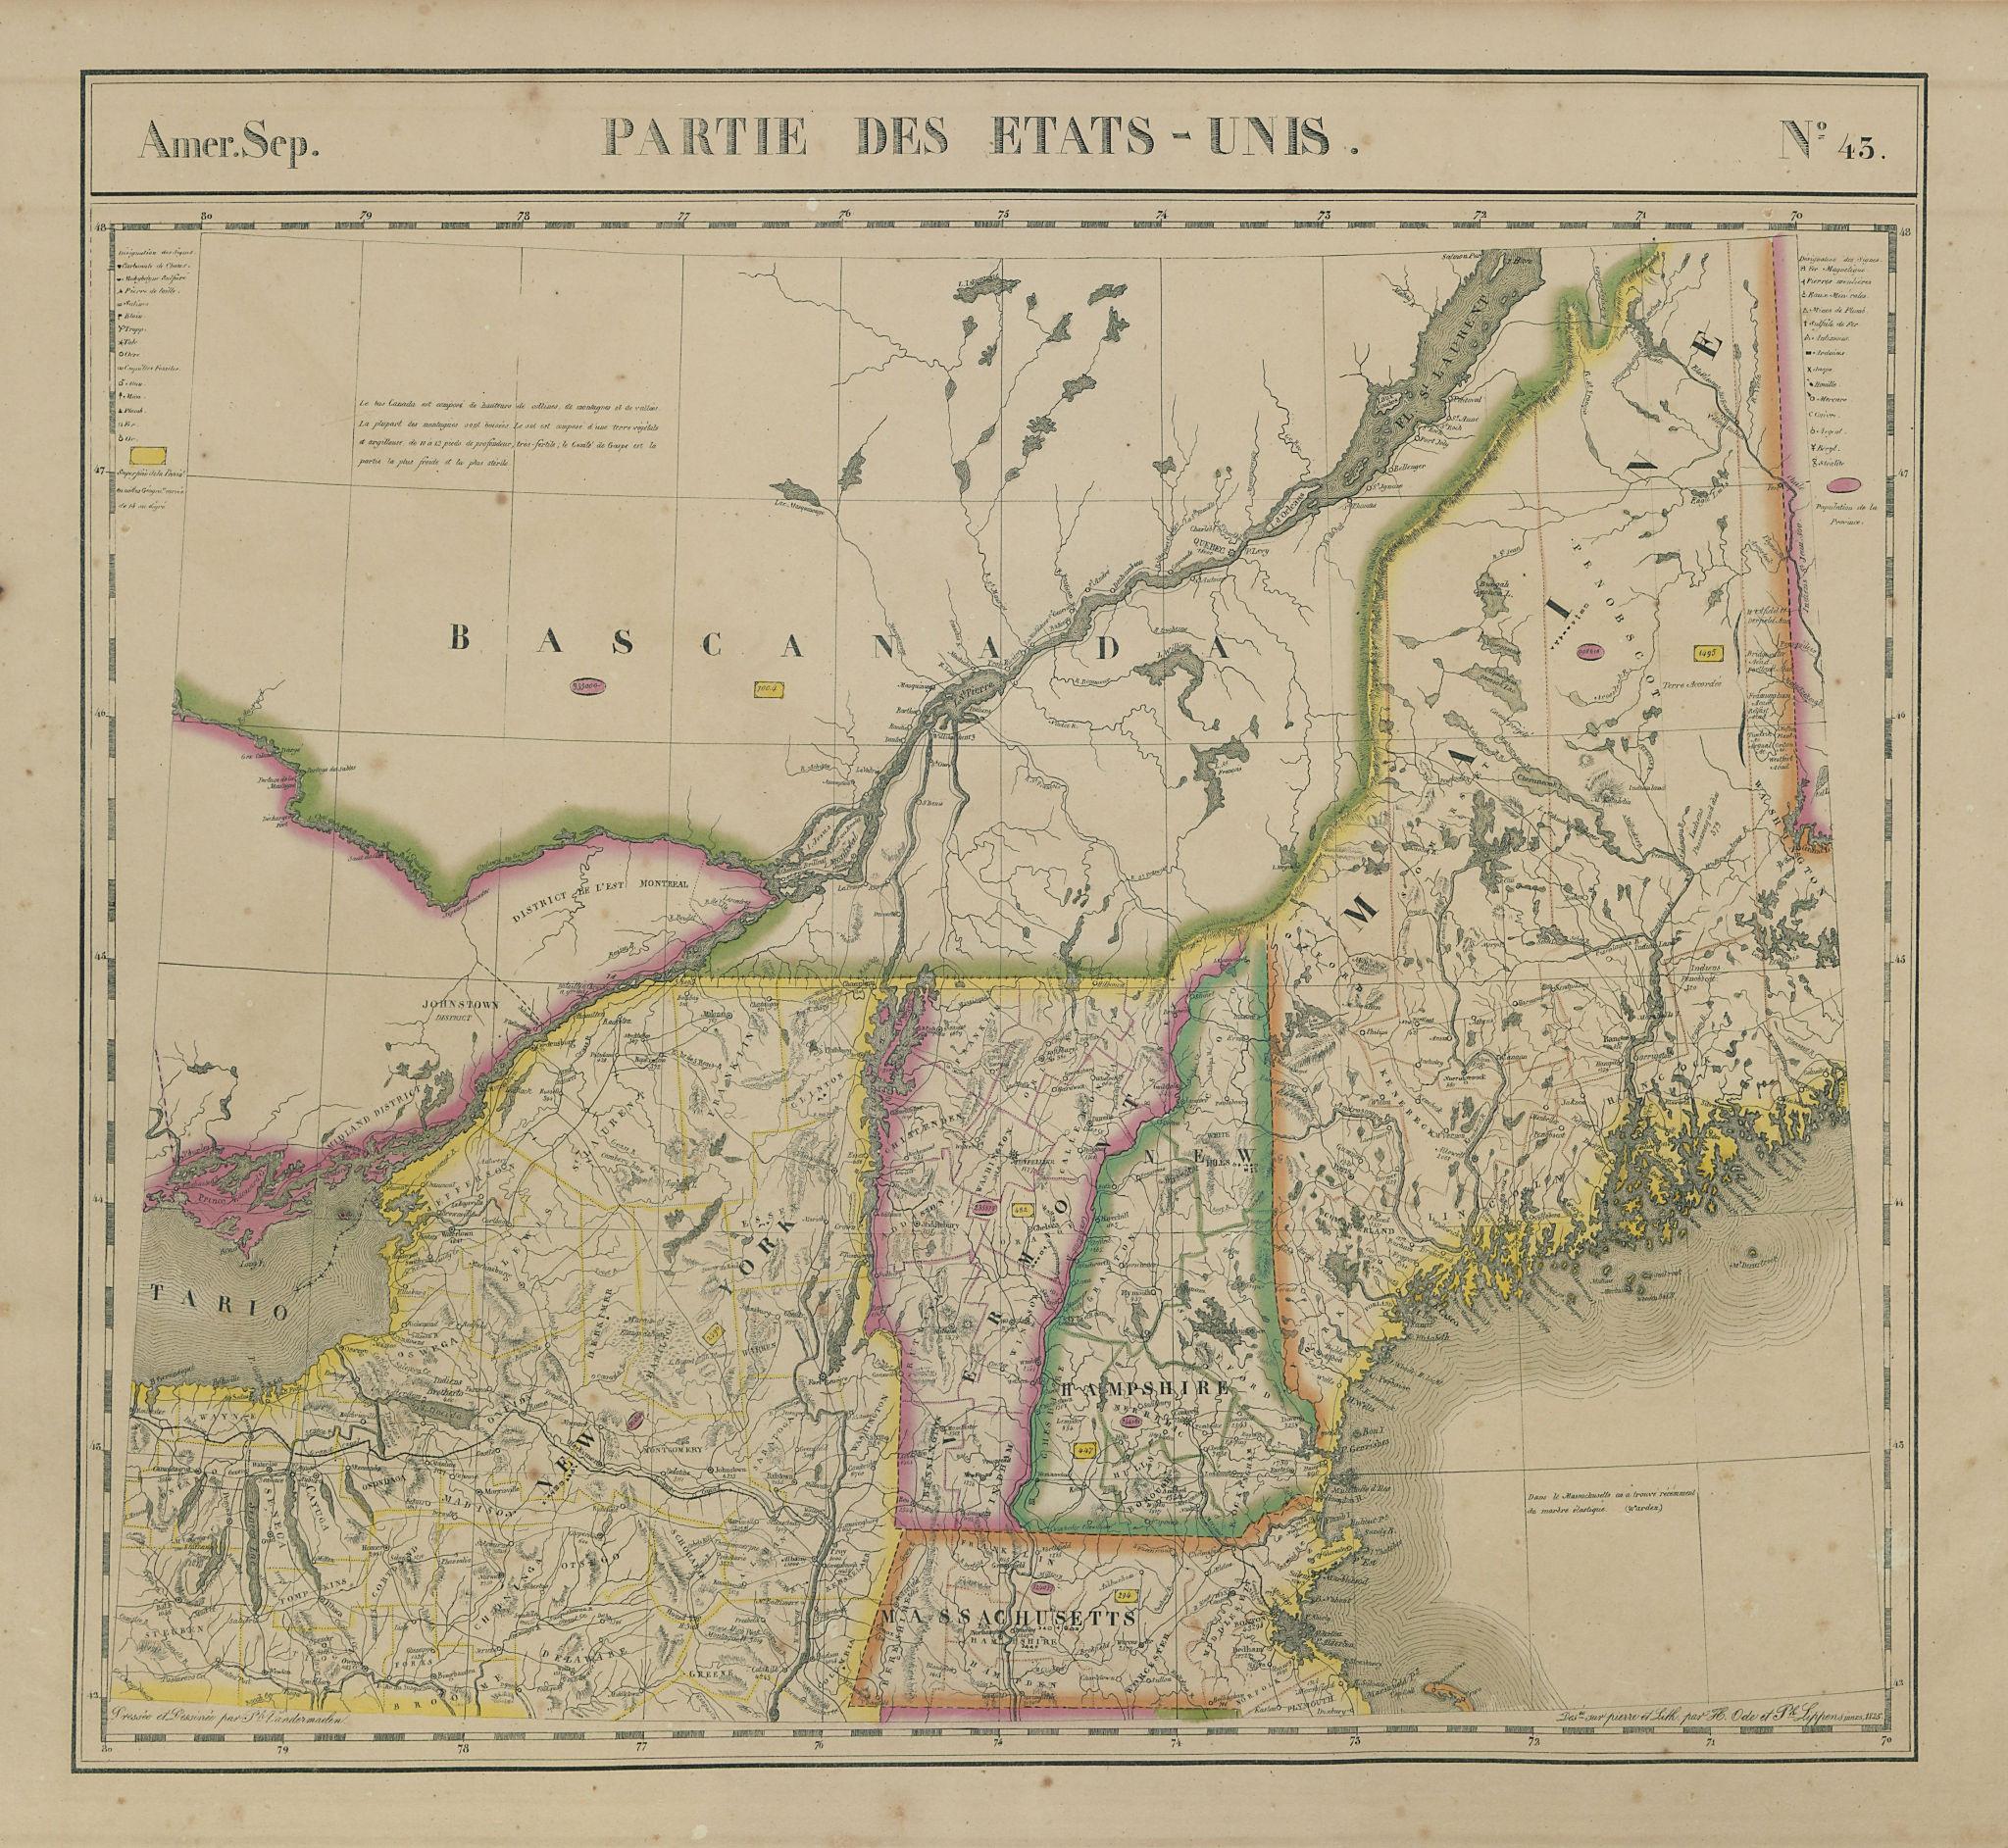 Amér. Sep. Partie des États-Unis #43 Canada New England NY VANDERMAELEN 1827 map